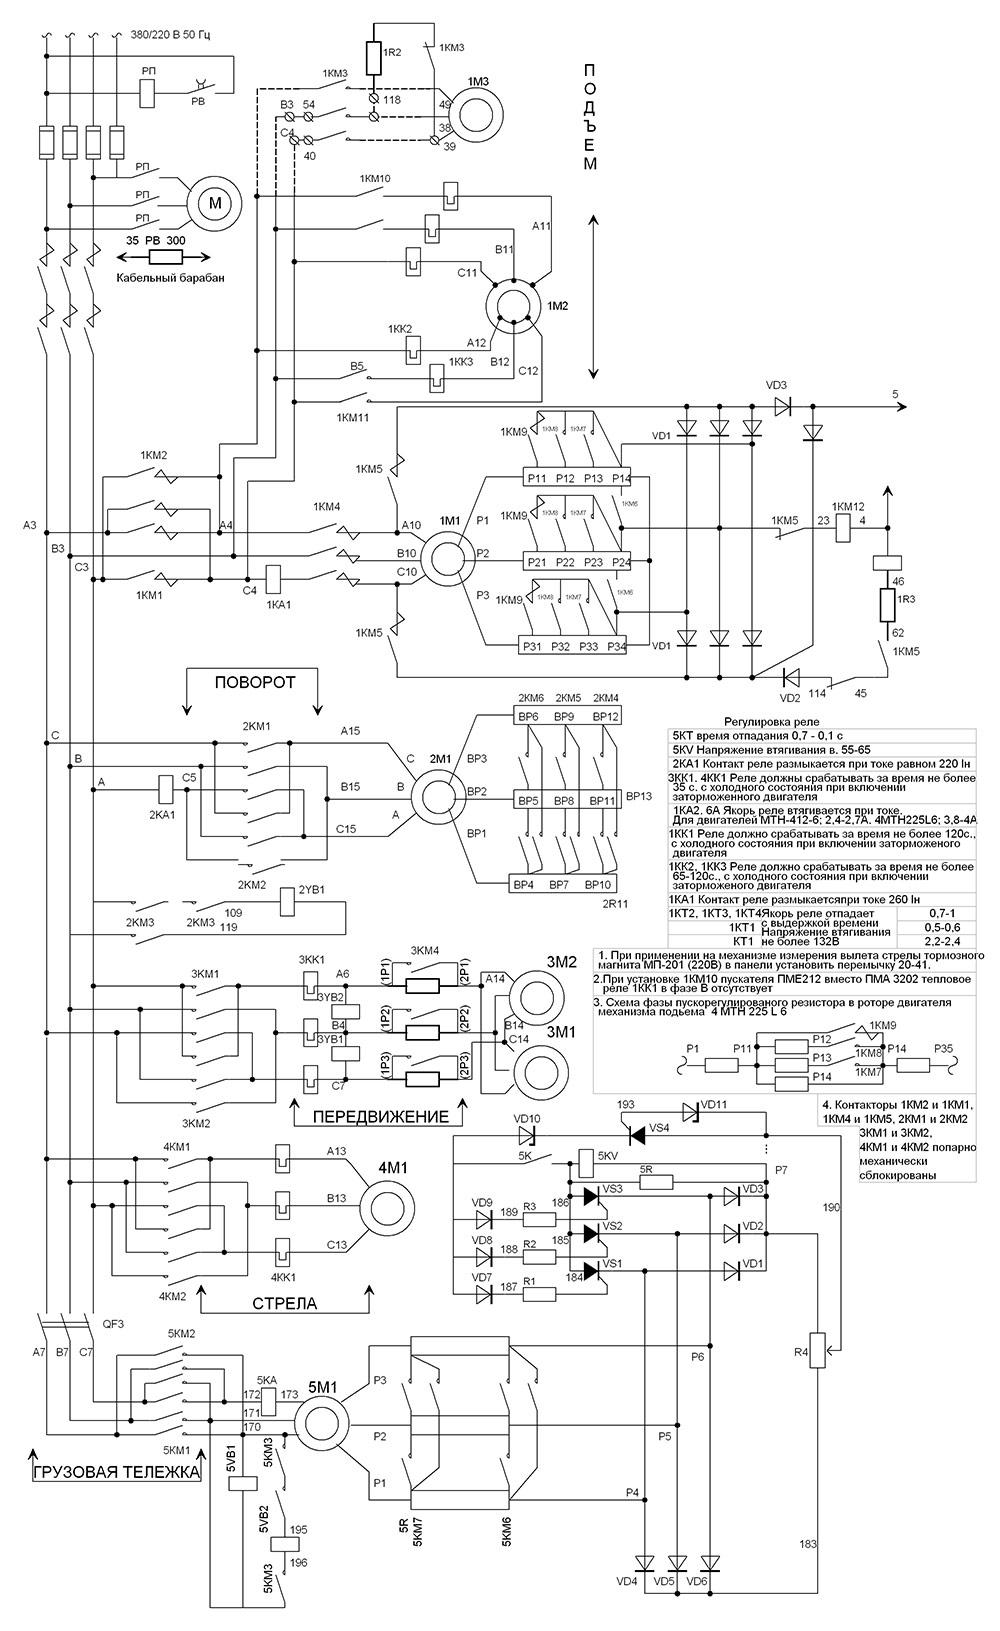 Электросхема КБ-403